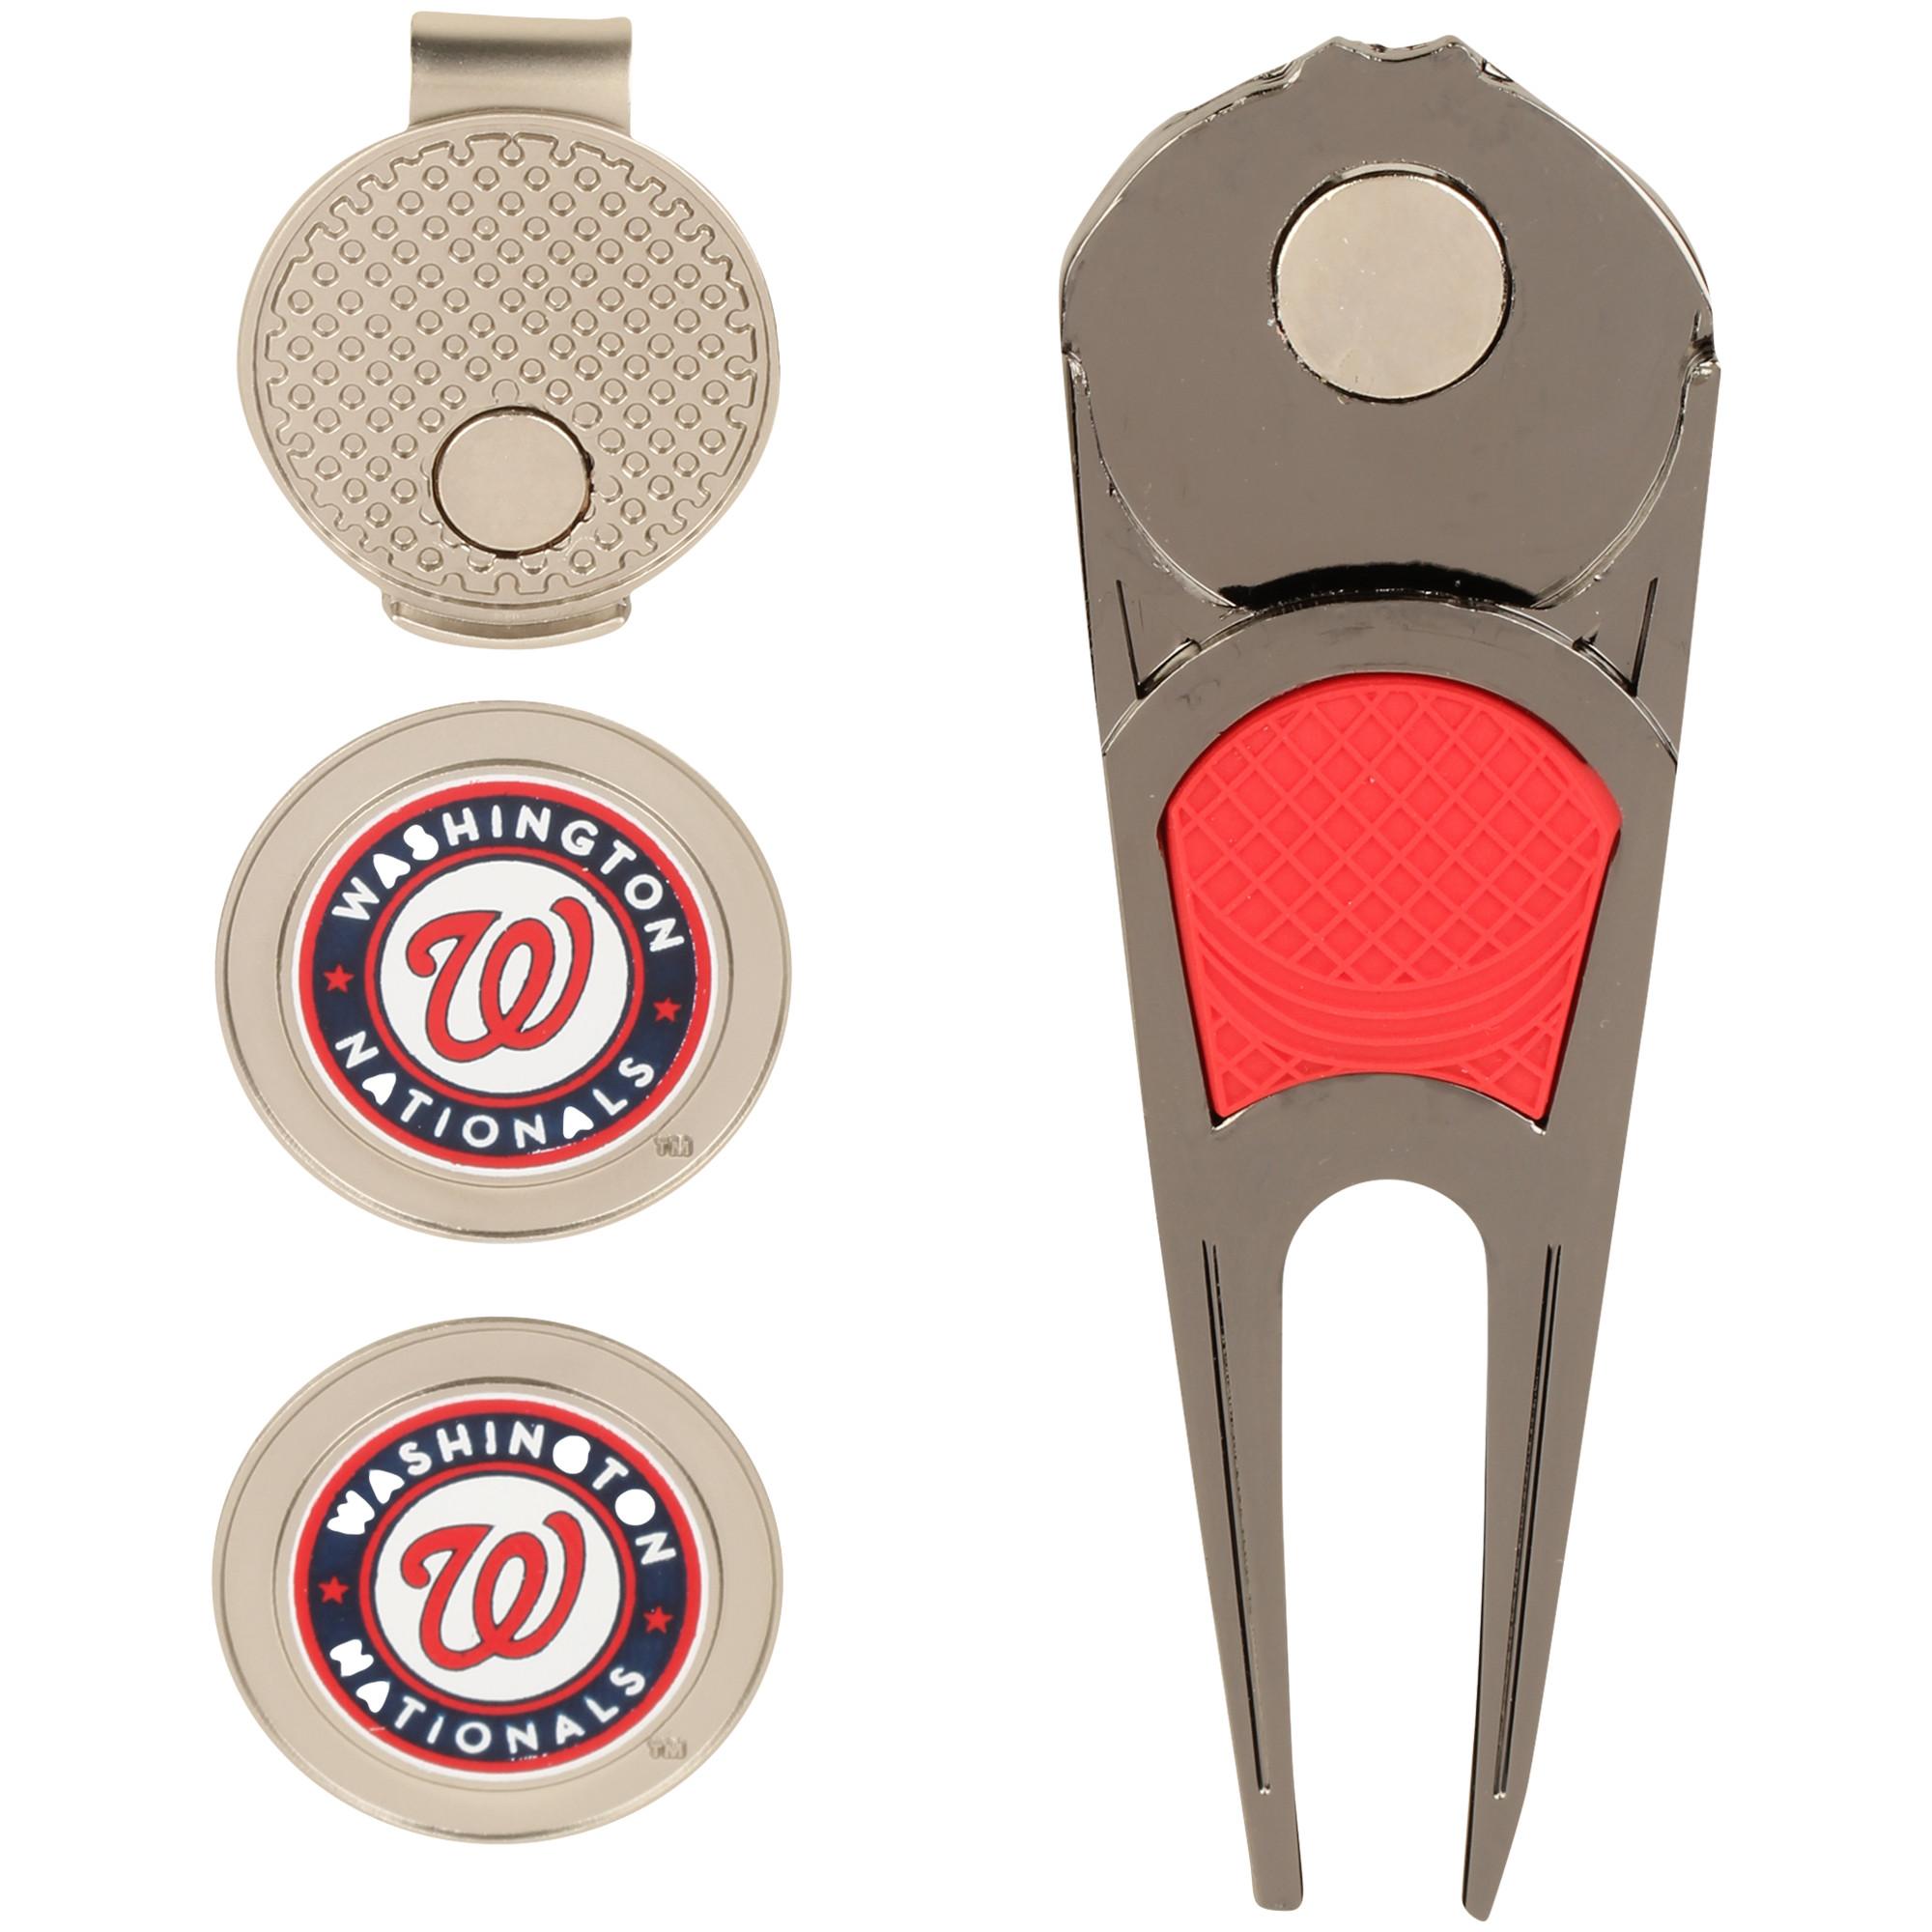 Washington Nationals WinCraft Ball Marker, Hat Clip & Divot Repair Tool Set - No Size